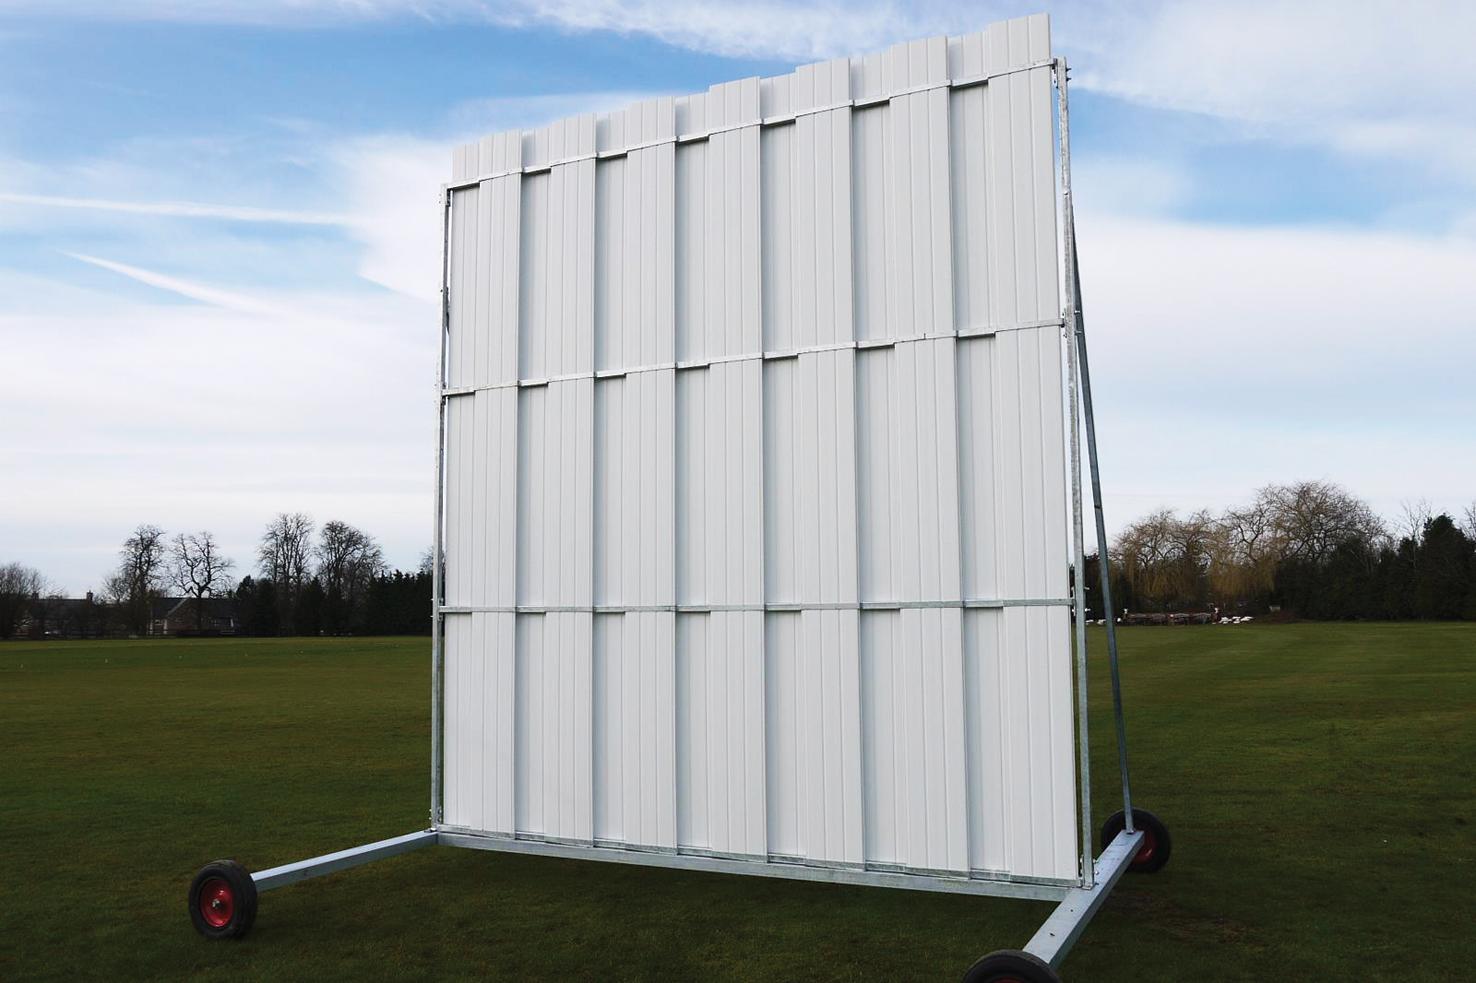 Stadia Elite' Polypropylene Cricket Sight Screens - 4.5m High x 4m Wide